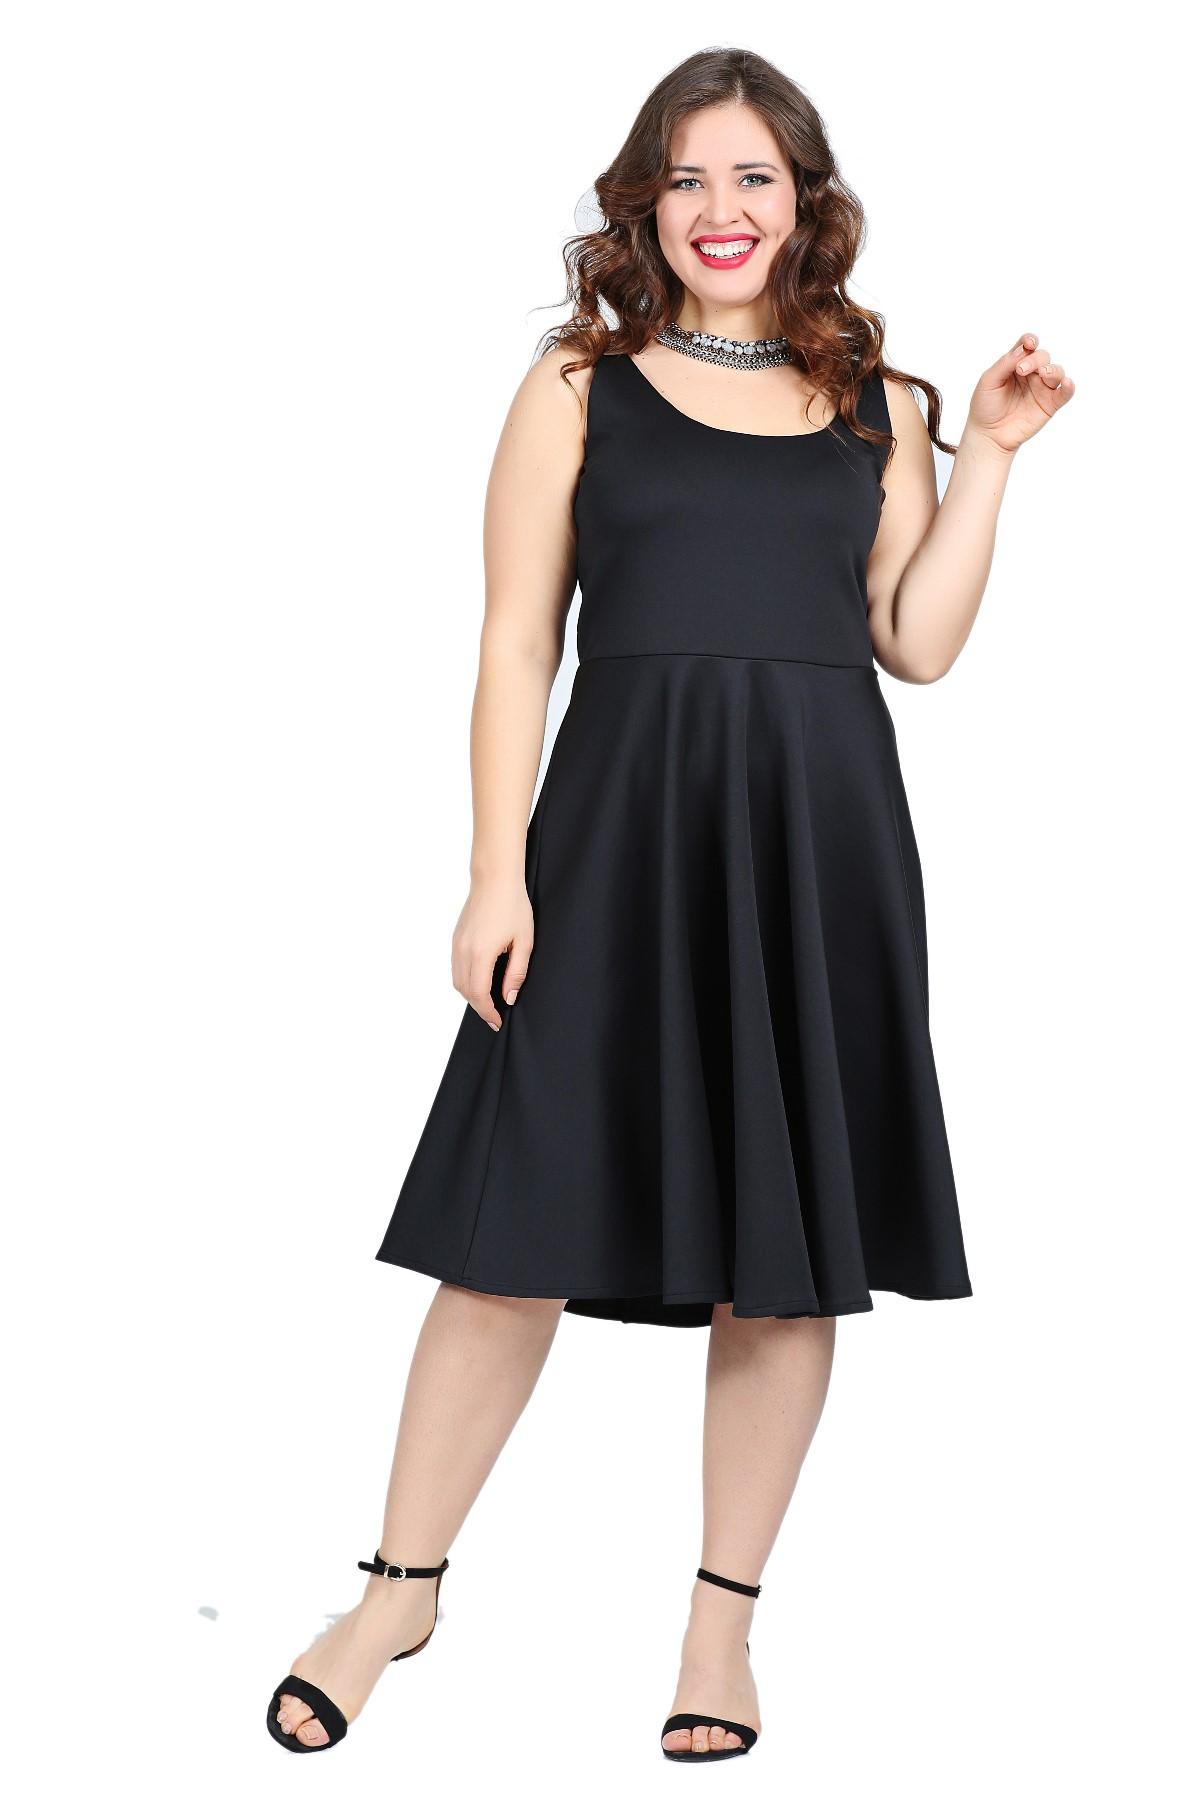 Schwarzes Knielanges Kleid Olastorm